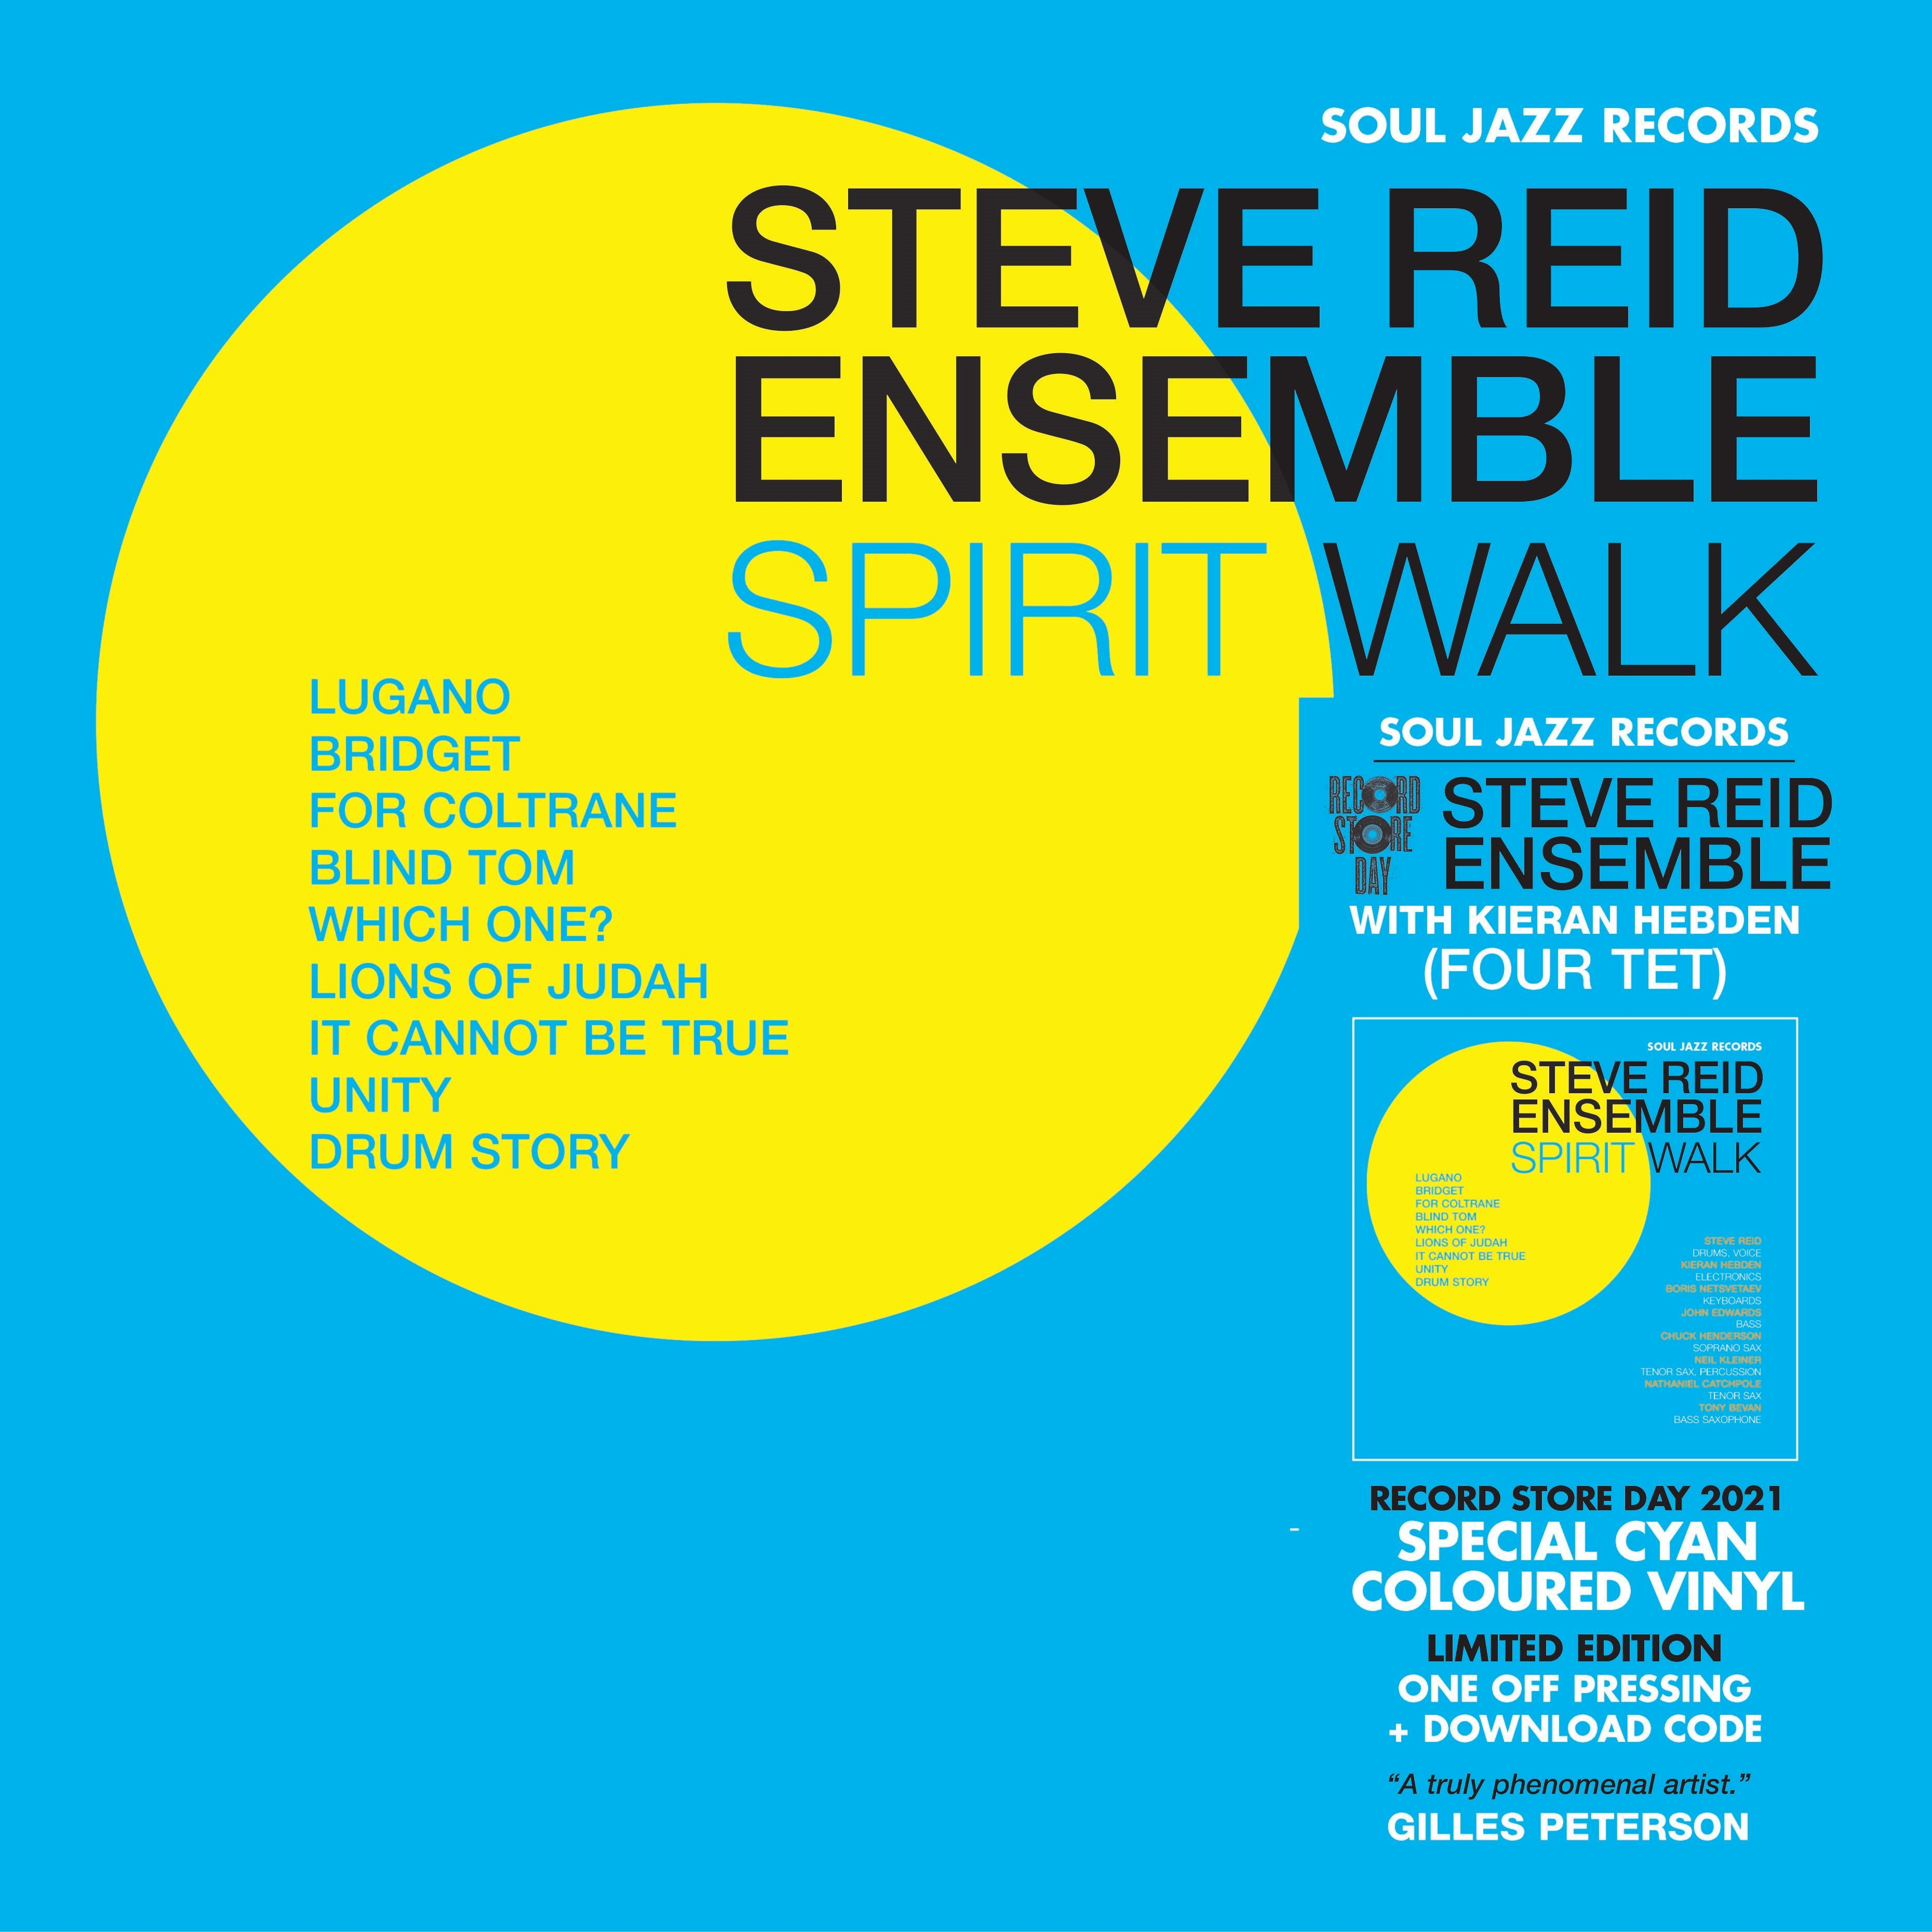 Steve Reid Ensemble With Kieran Hebden (Four Tet) - Spirit Walk [LTD 2xLP] (RSD21)